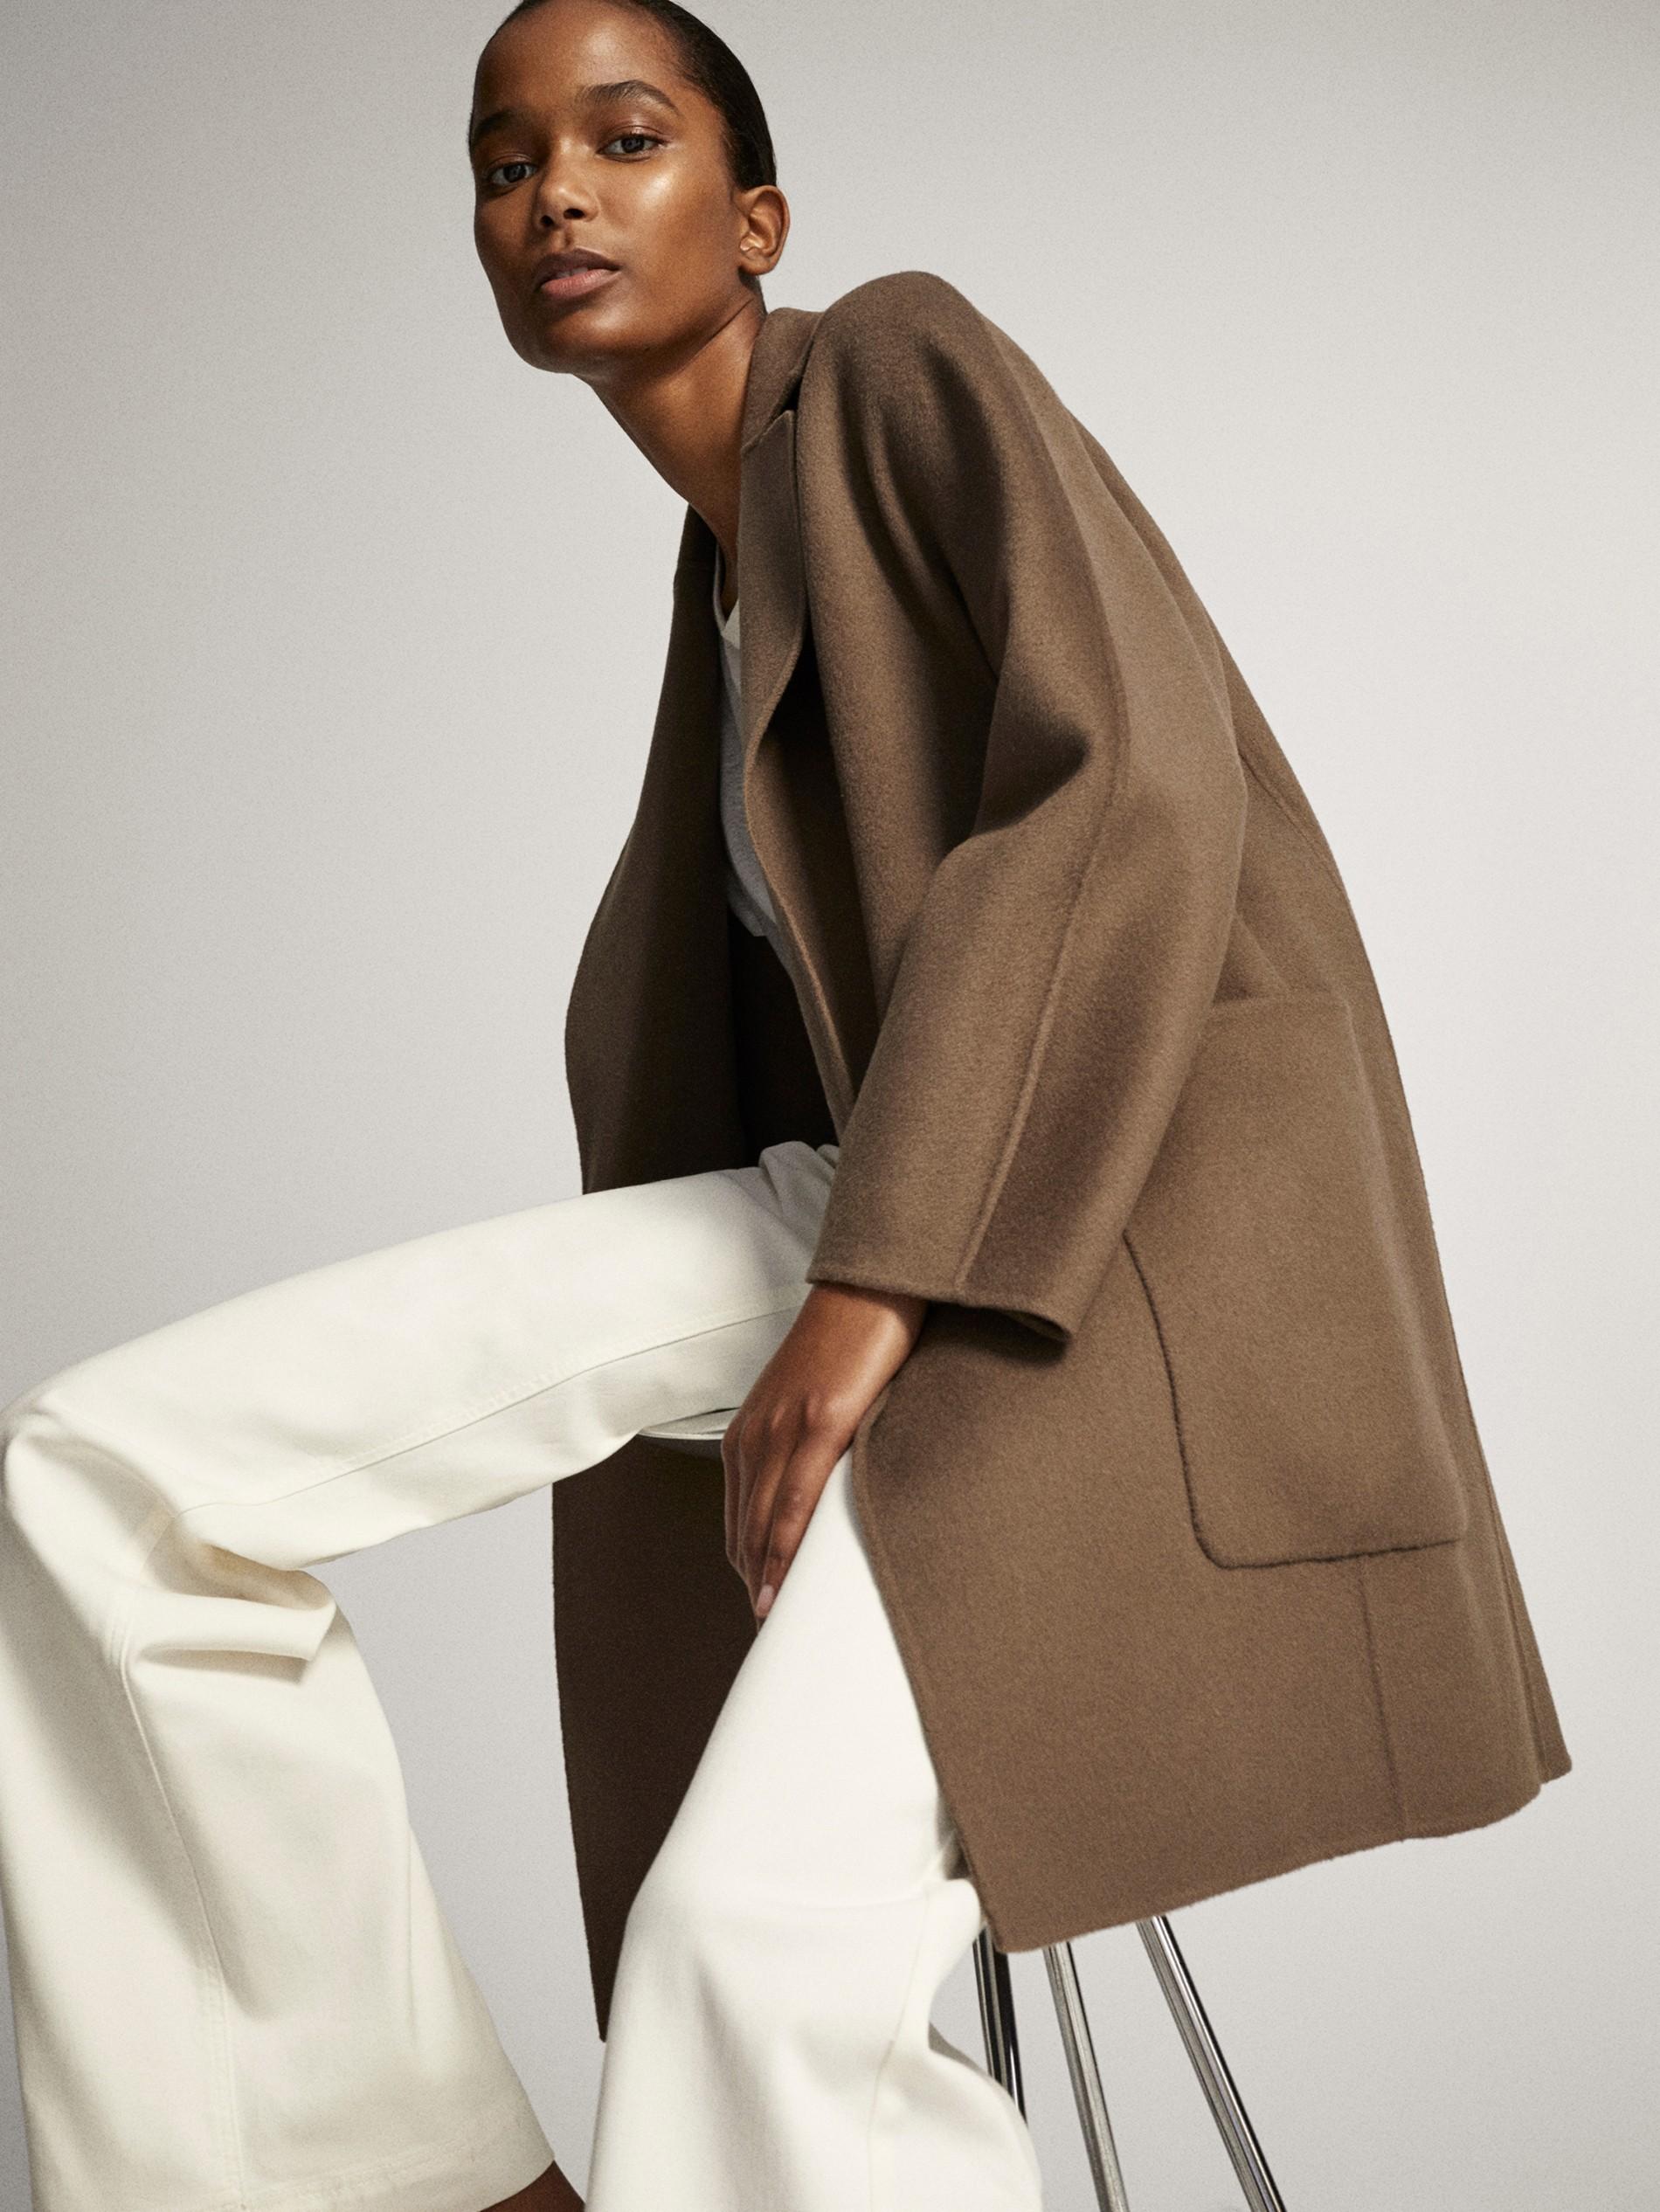 Dutti Collection Tout Voir Manteaux Femmes Massimo D9IYeWEH2b